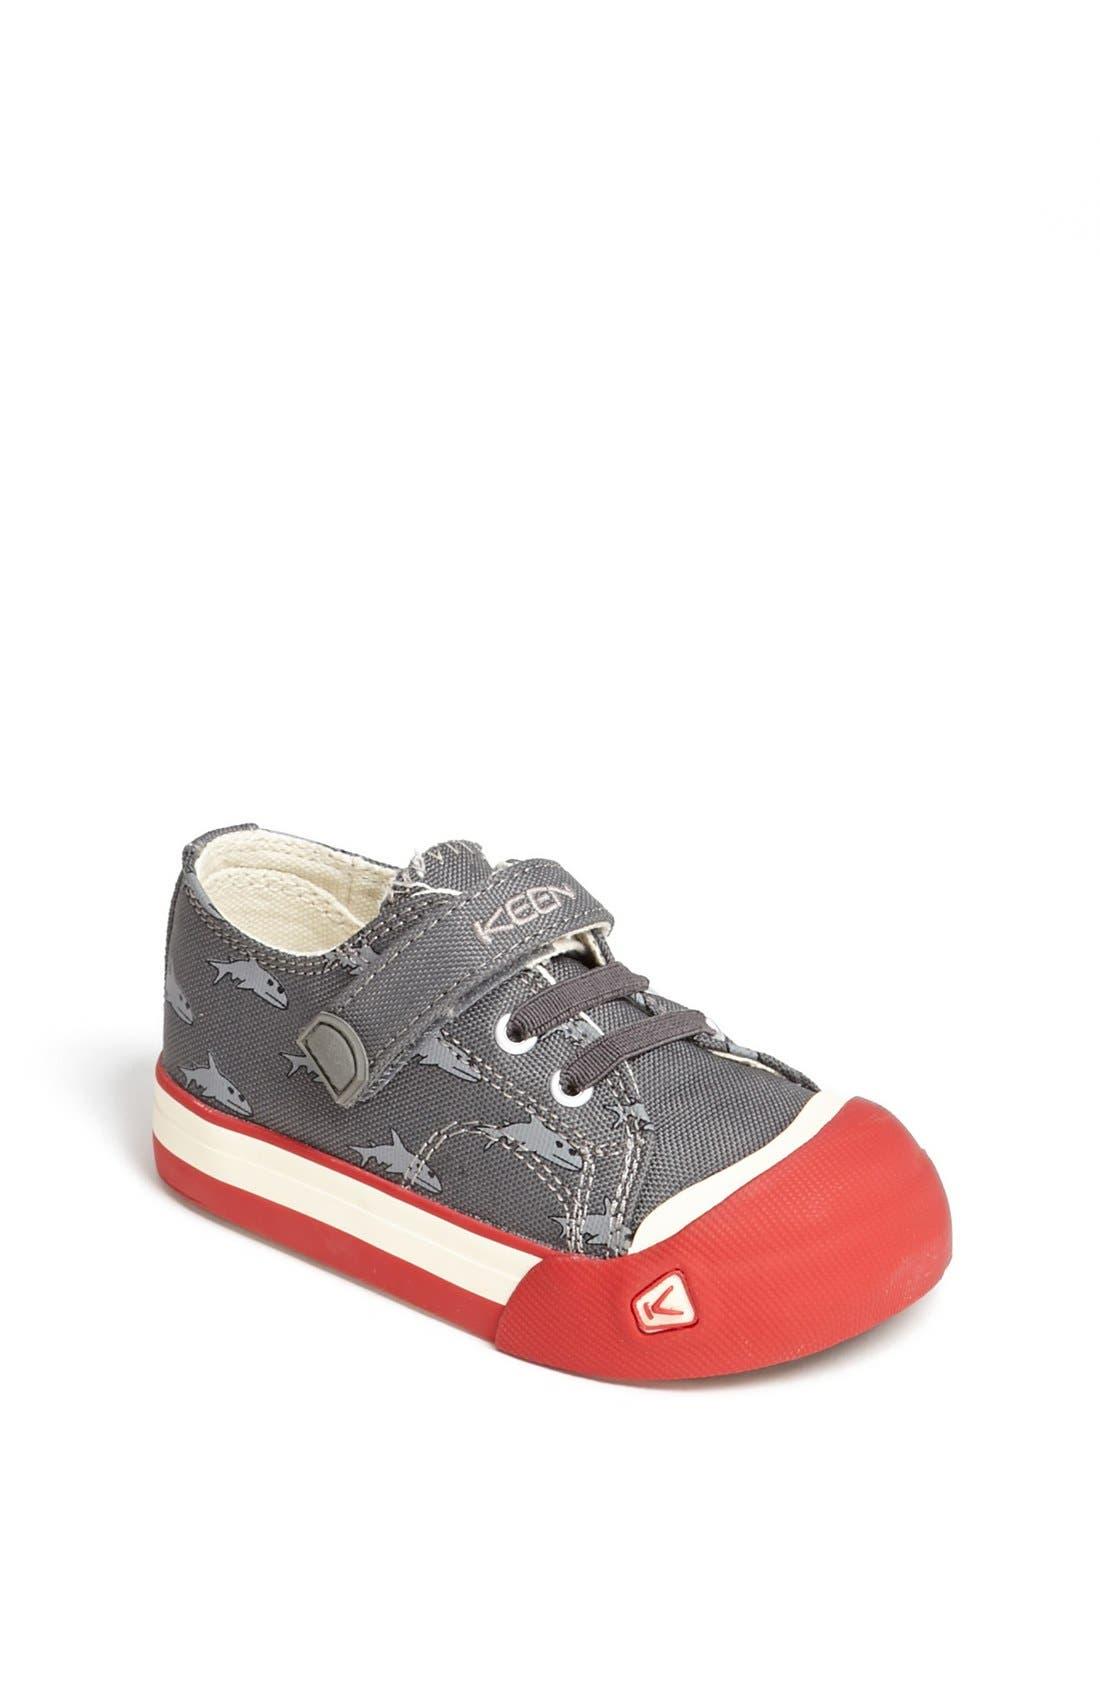 Main Image - Keen 'Coronado' Print Sneaker (Baby, Walker, Toddler, Little Kids)